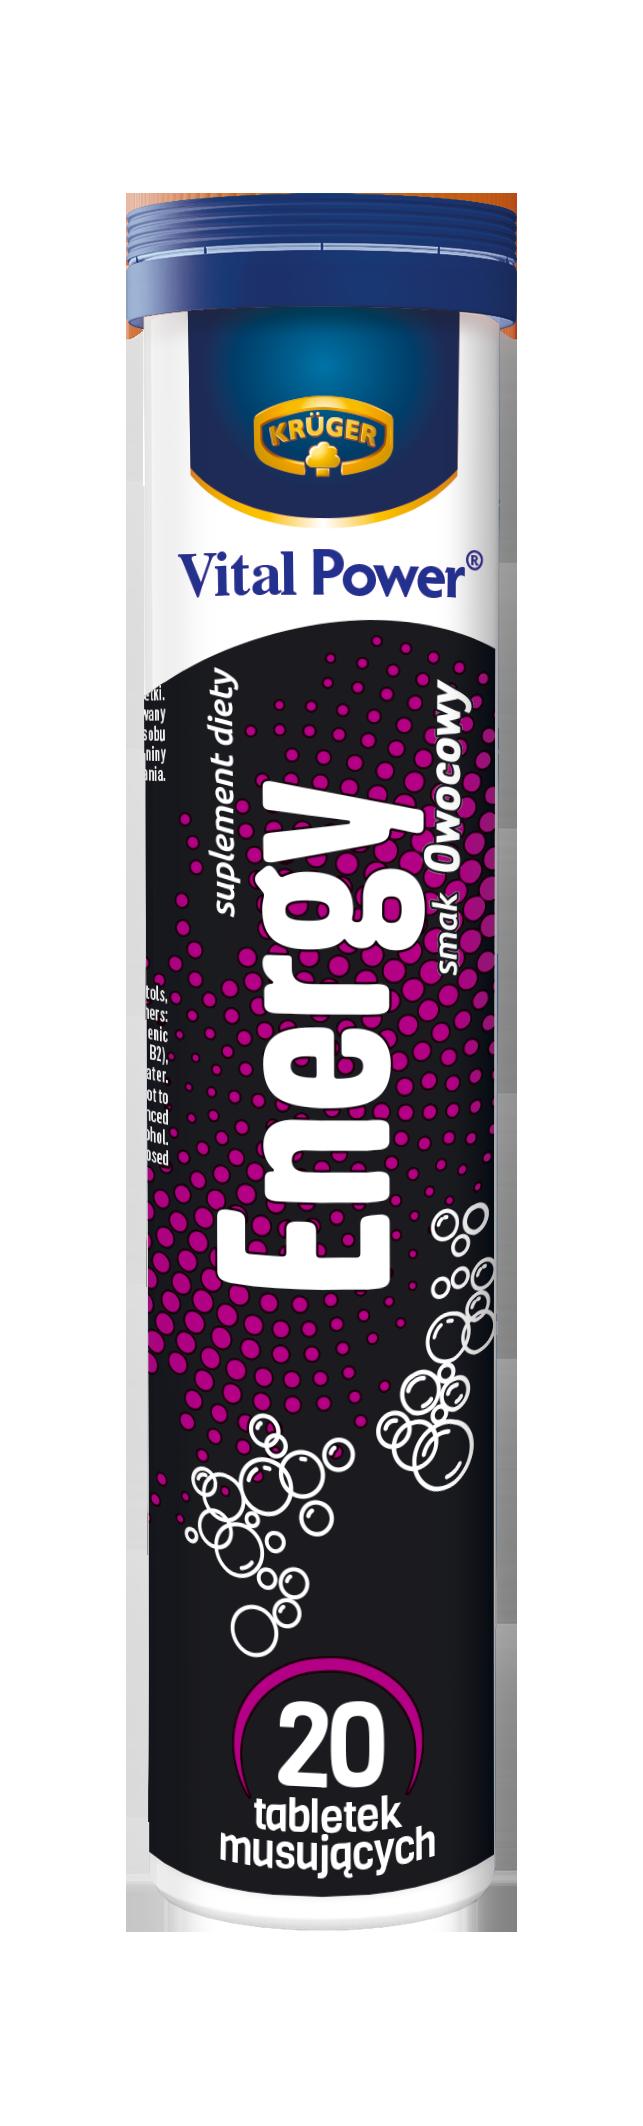 Krüger Energy Suplement diety. 20 tabletek musujących o smaku owocowym.